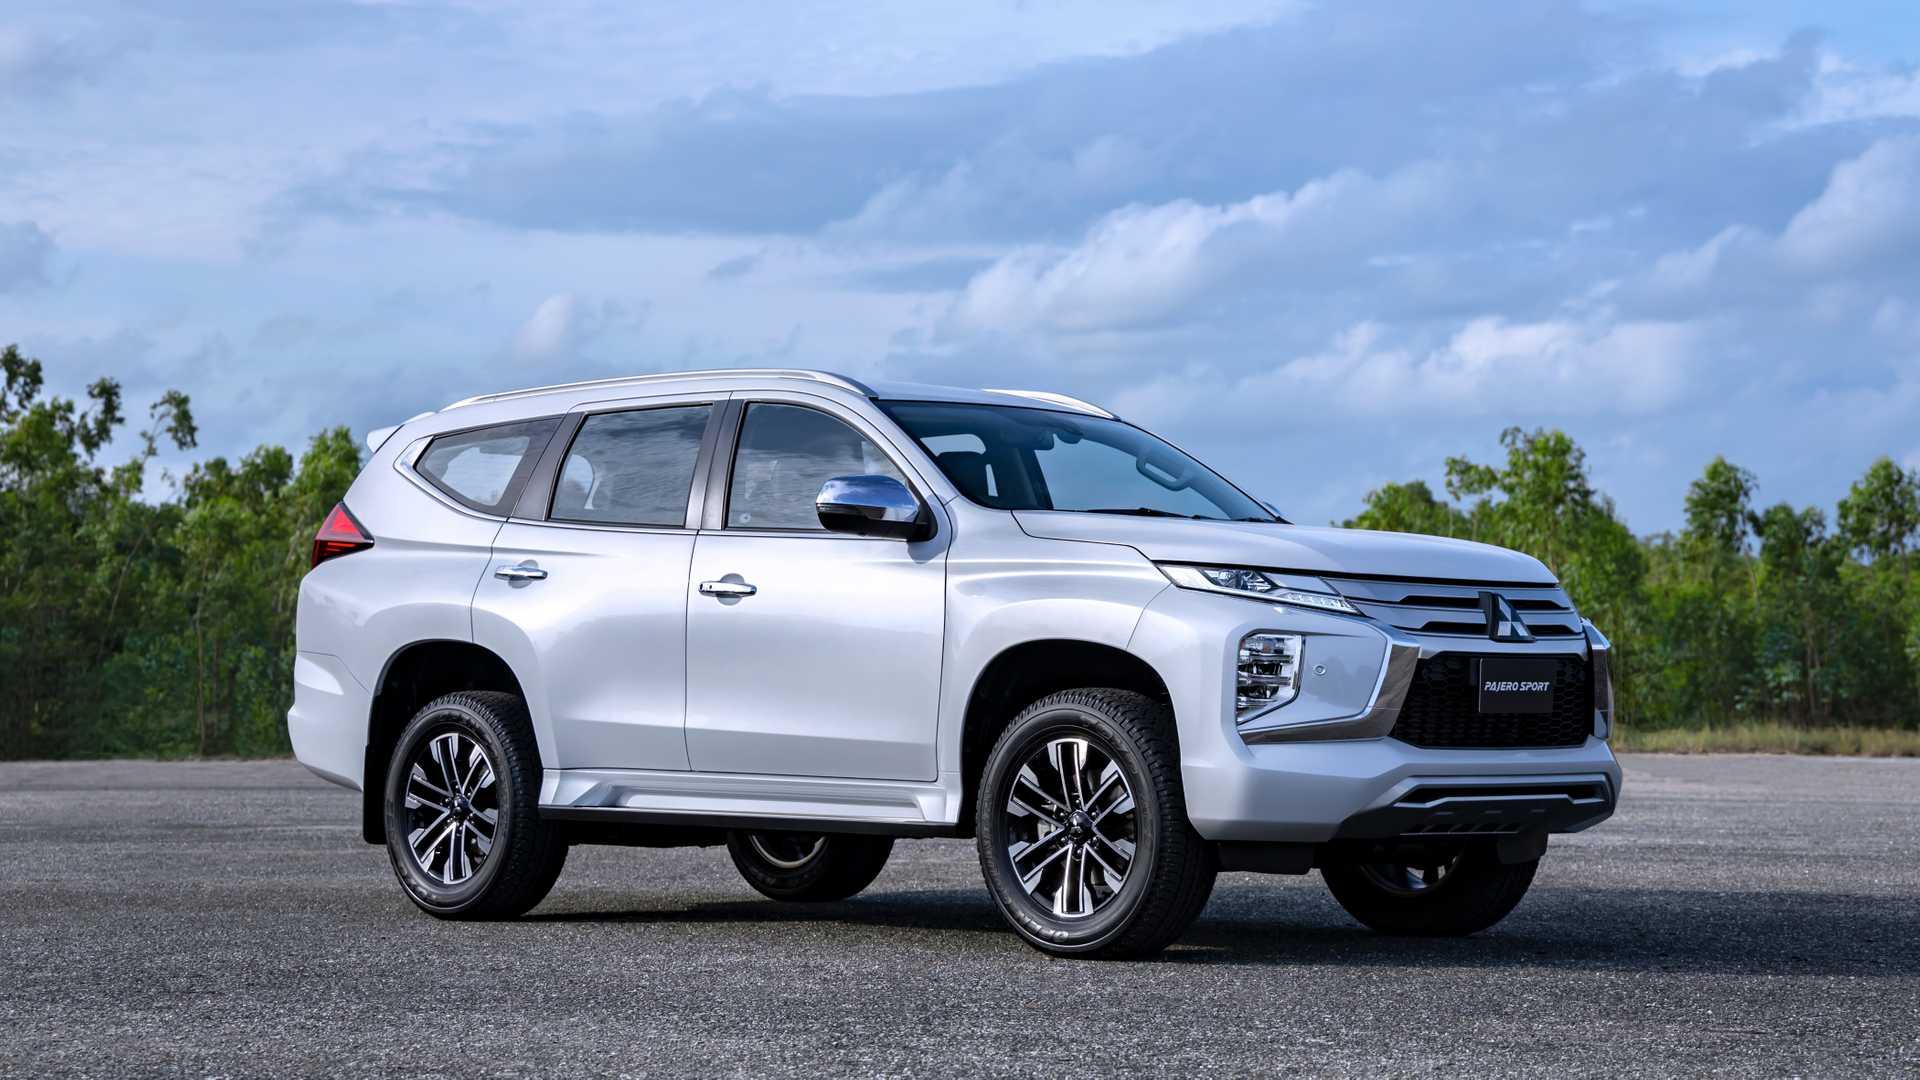 2020_Mitsubishi_Pajero_Sport_facelift_0001